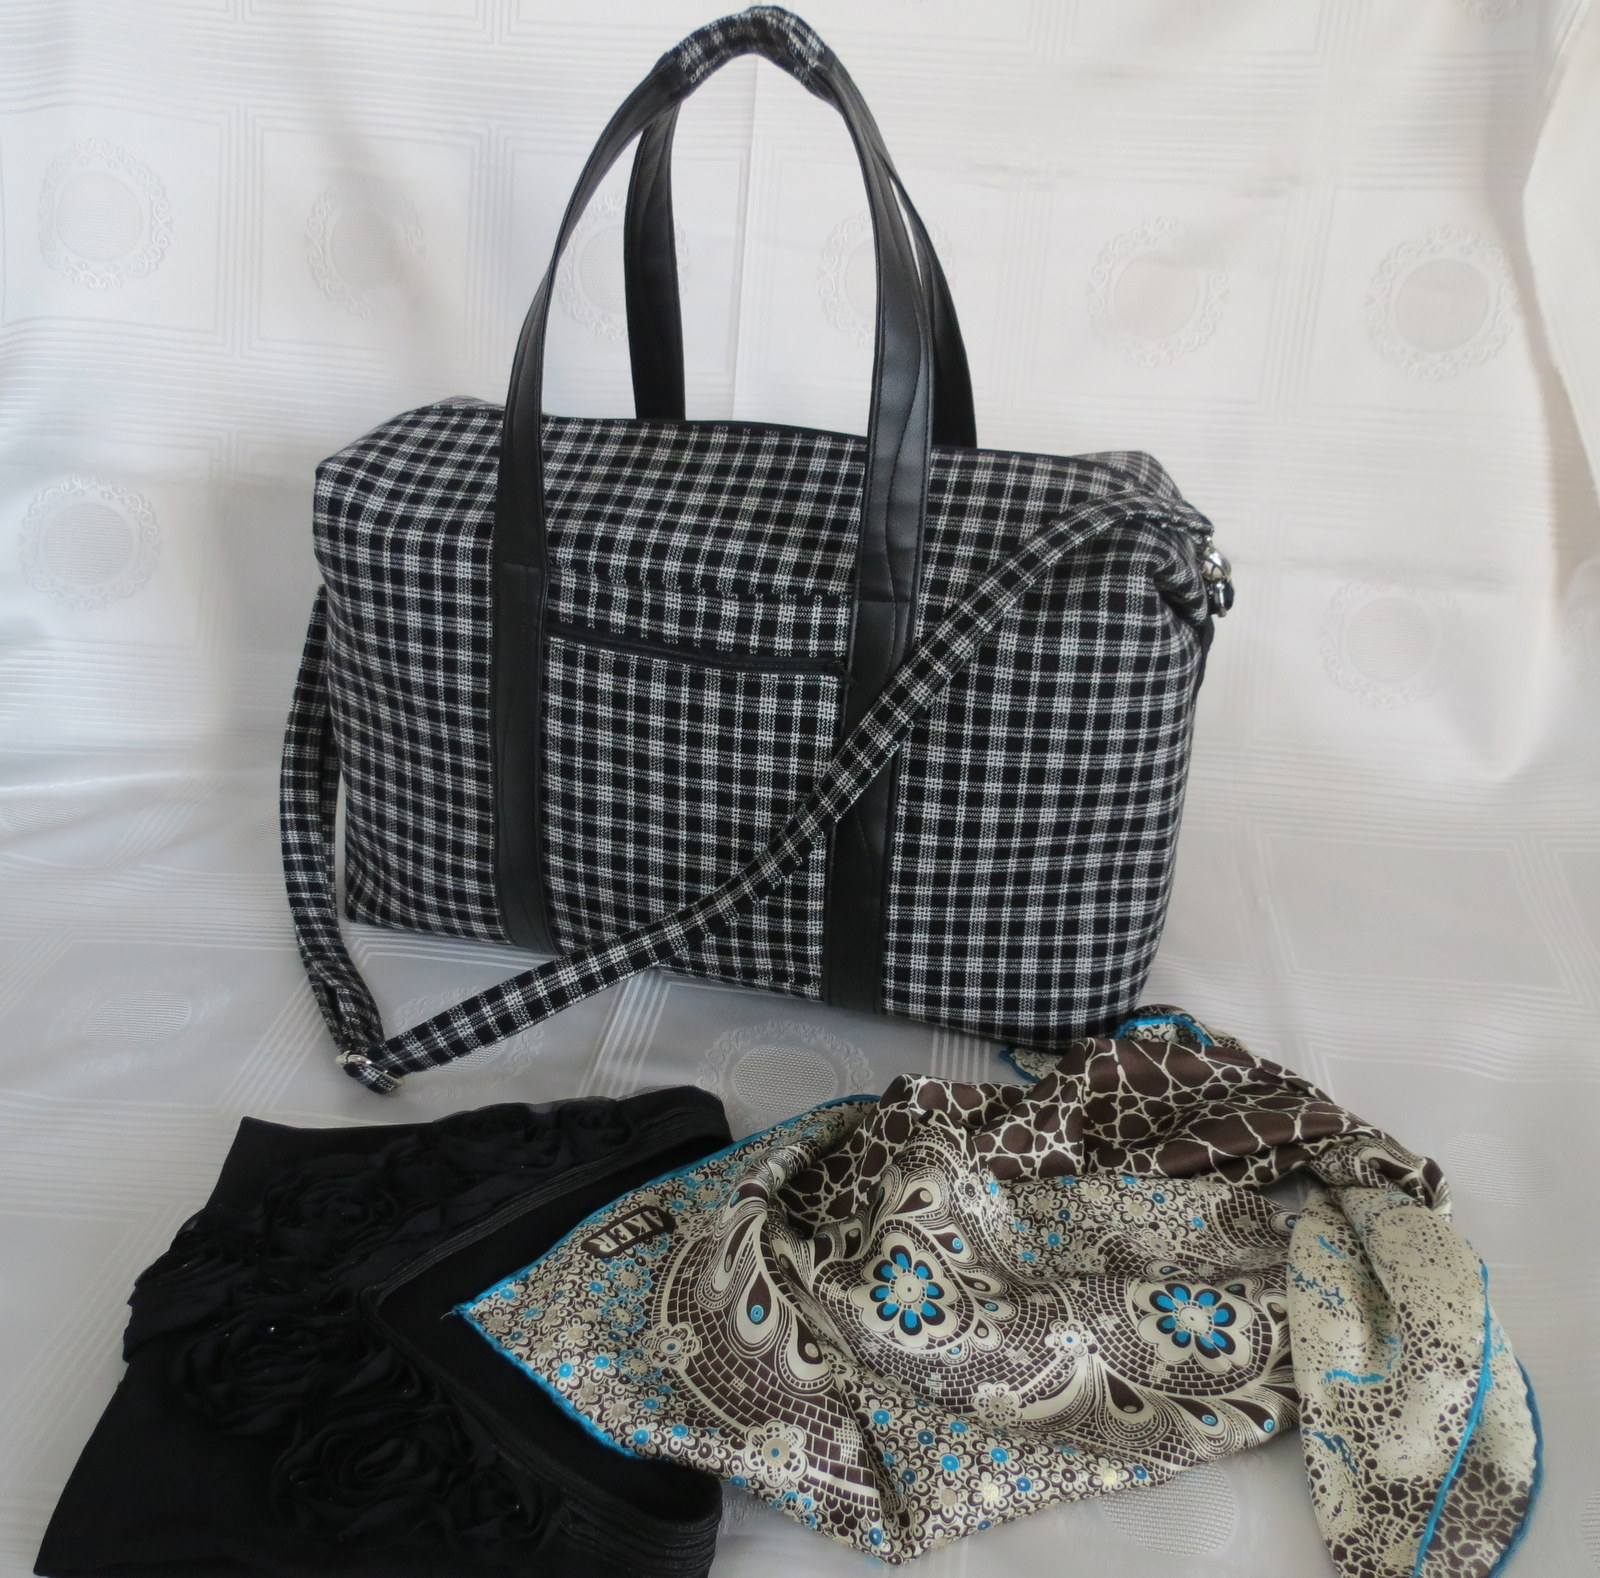 Sew Sweetness Emblem Duffle Bag, sewn by Maria